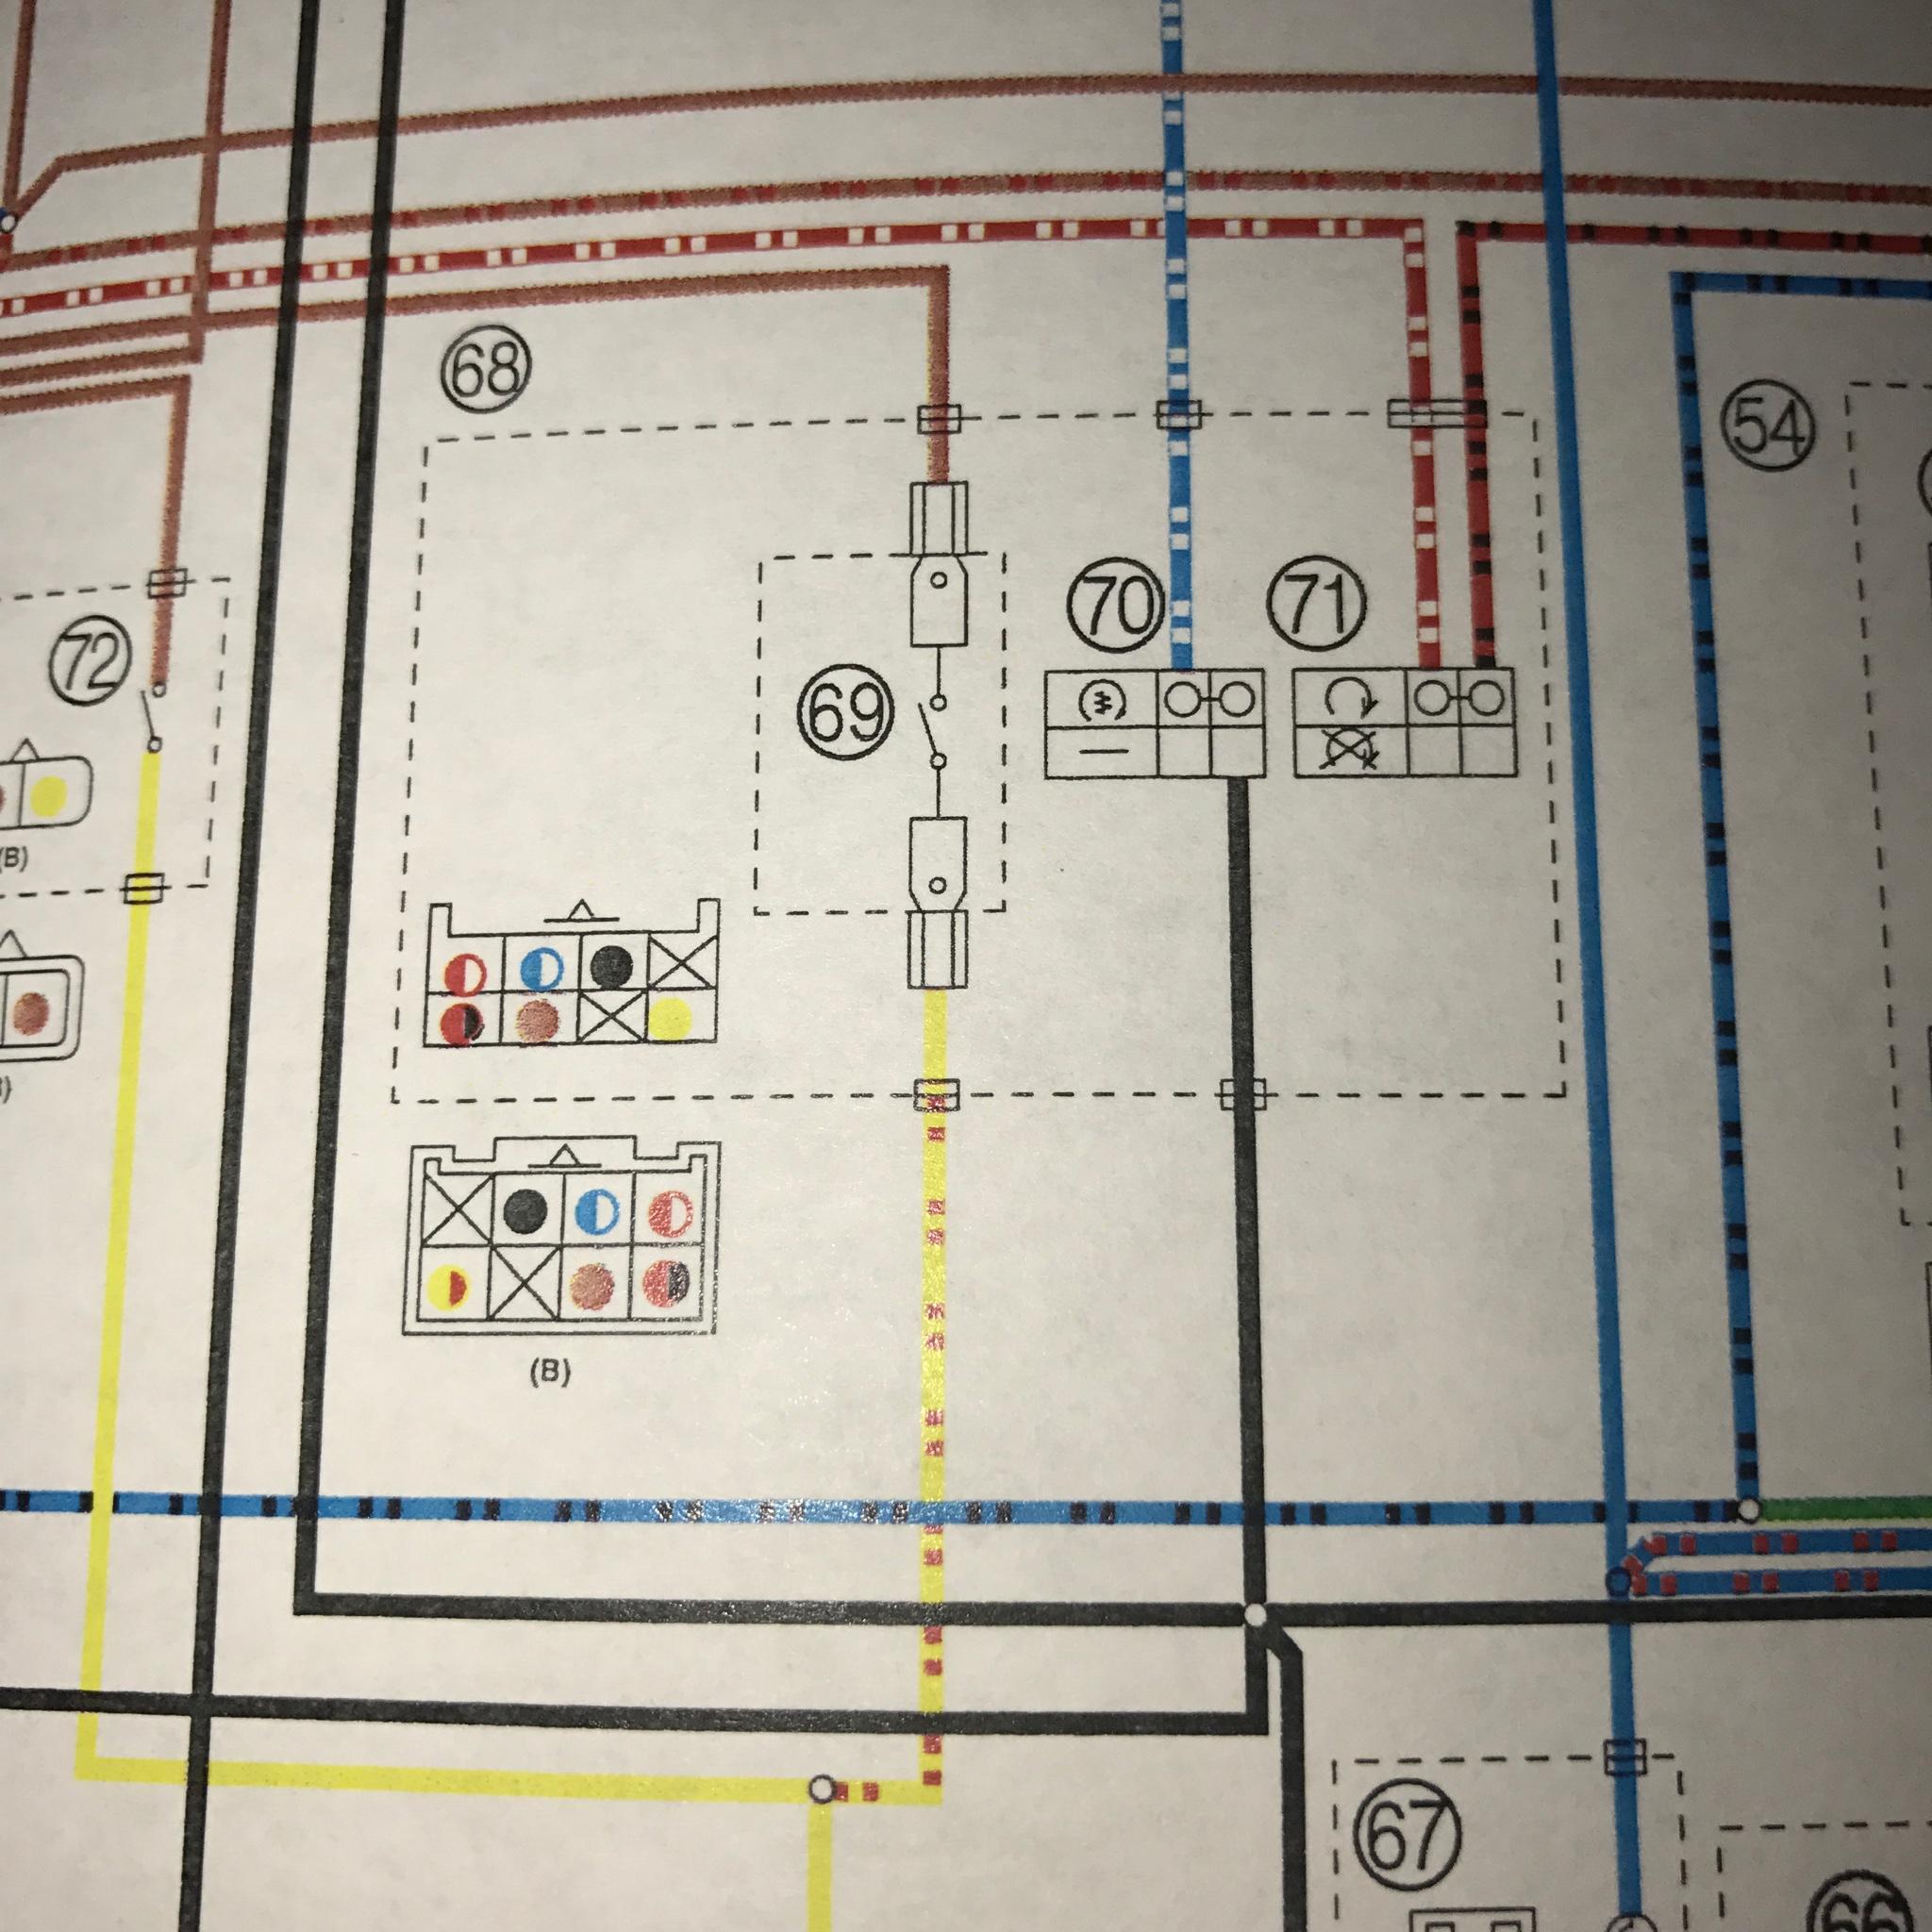 04 R6 Wiring Diagram - Wiring Diagrams List R S Wiring Diagram on